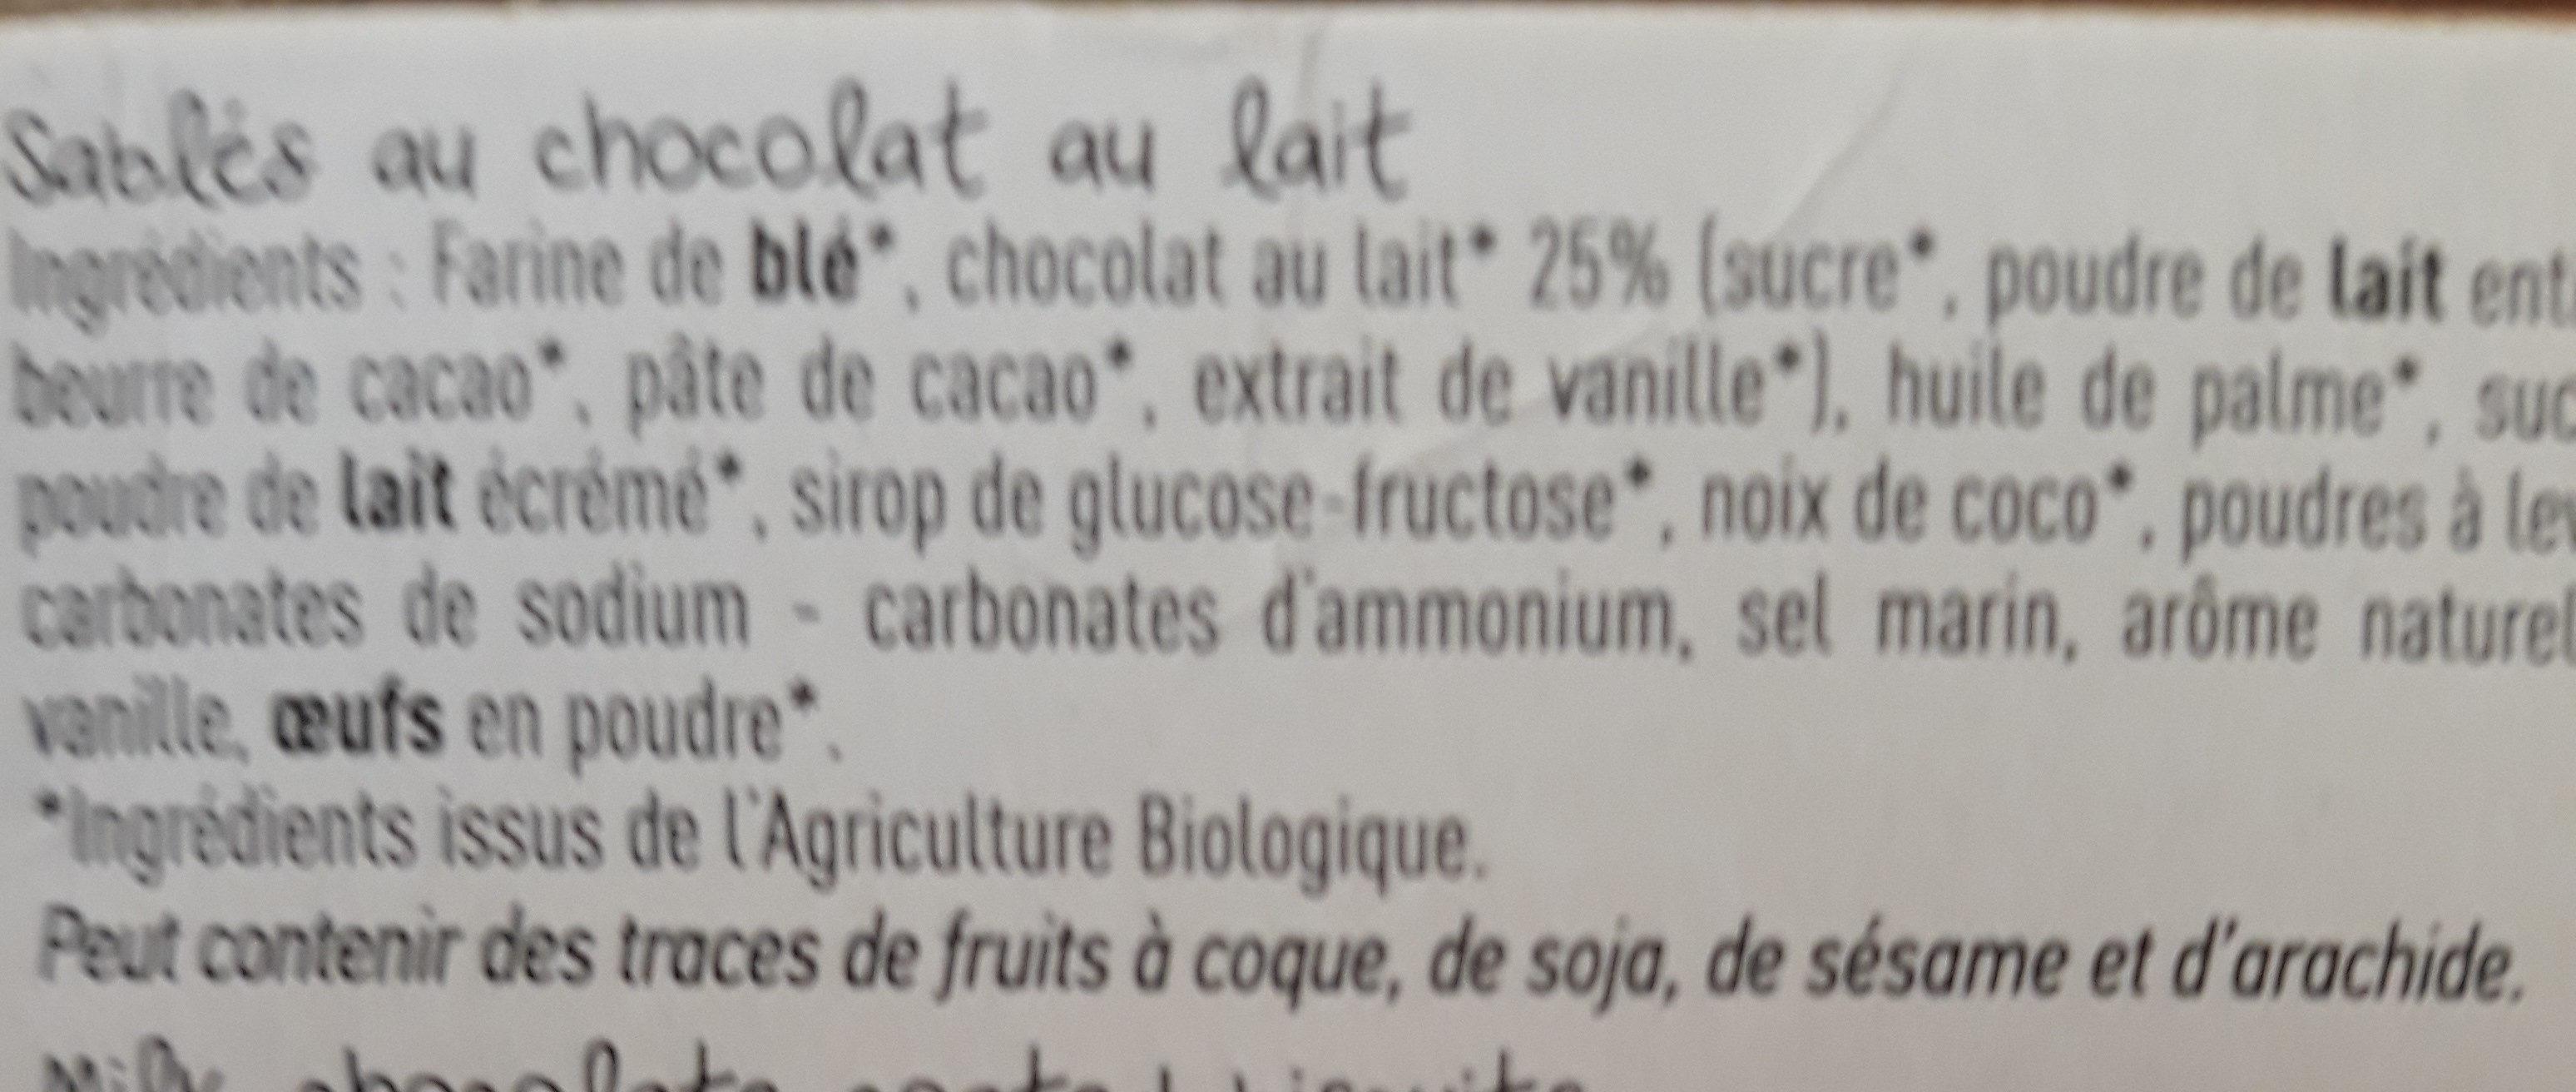 Biscuits nappés de chocolat lait - Ingrediënten - fr